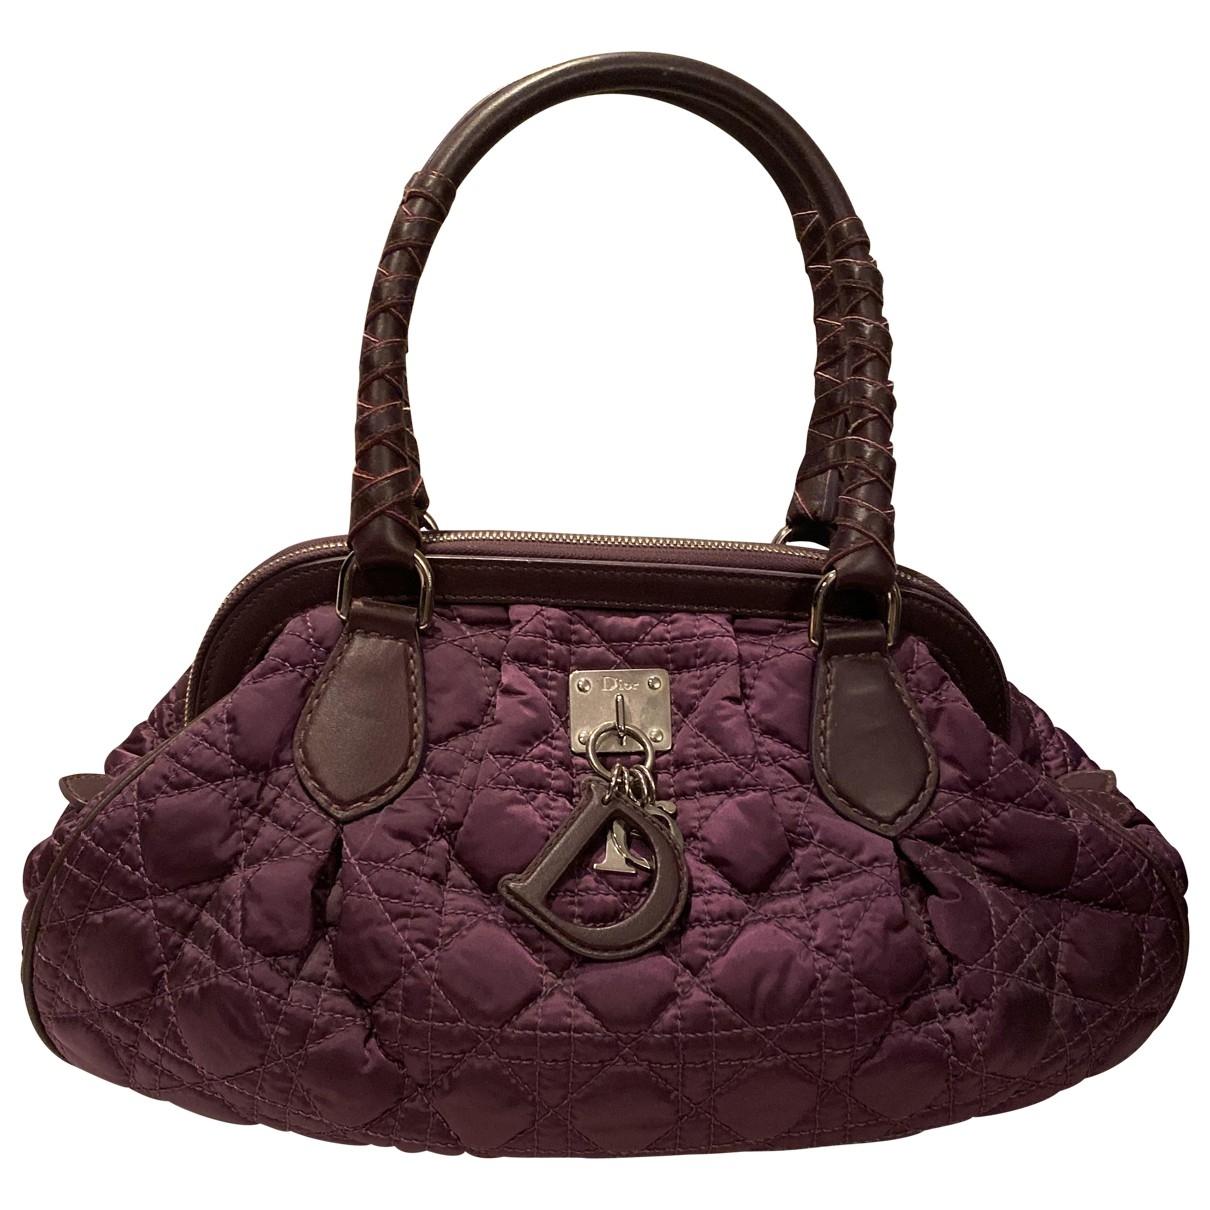 Dior - Sac a main Dior Soft Shopping pour femme en soie - violet